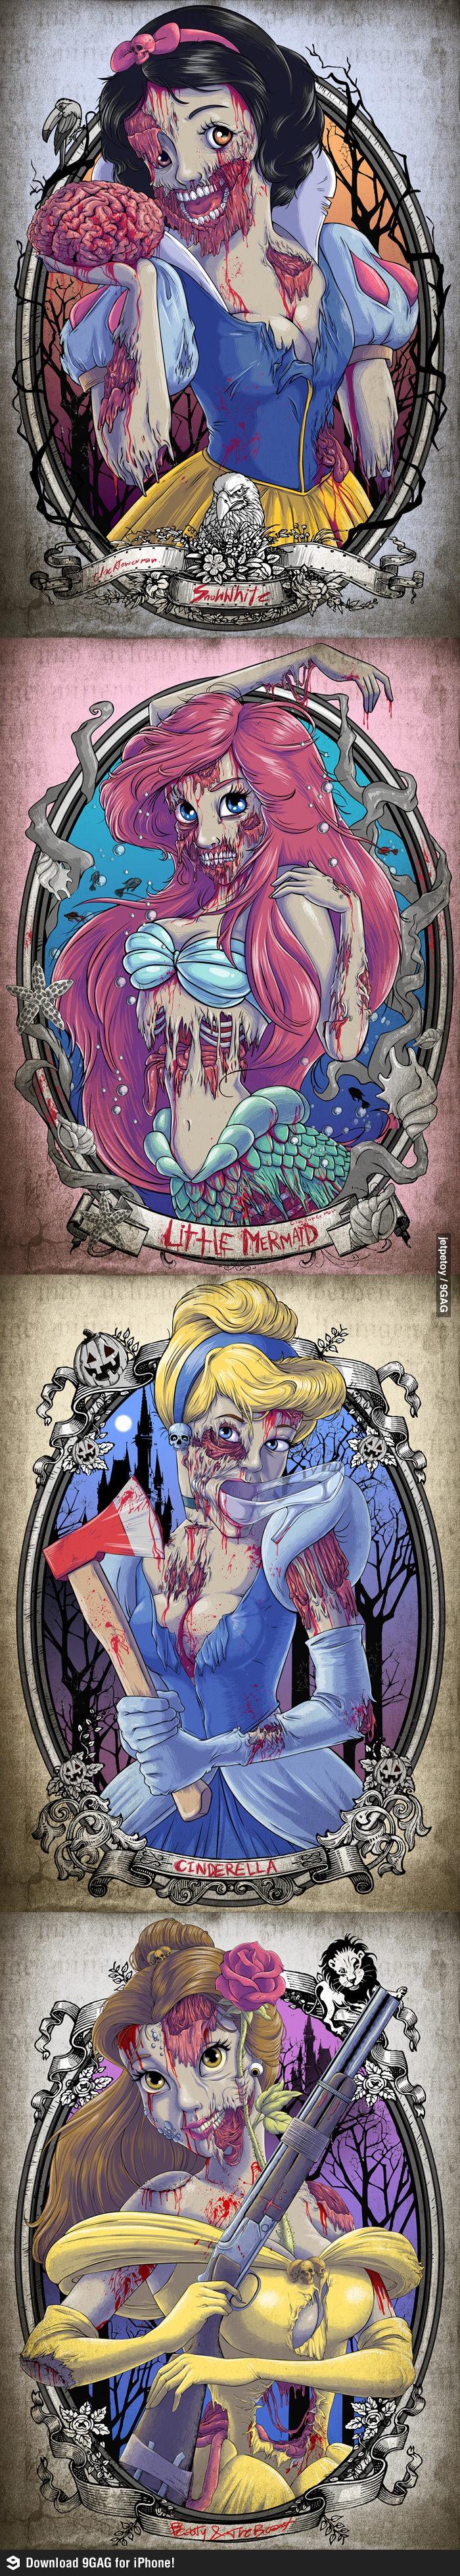 The Zombie Princesses